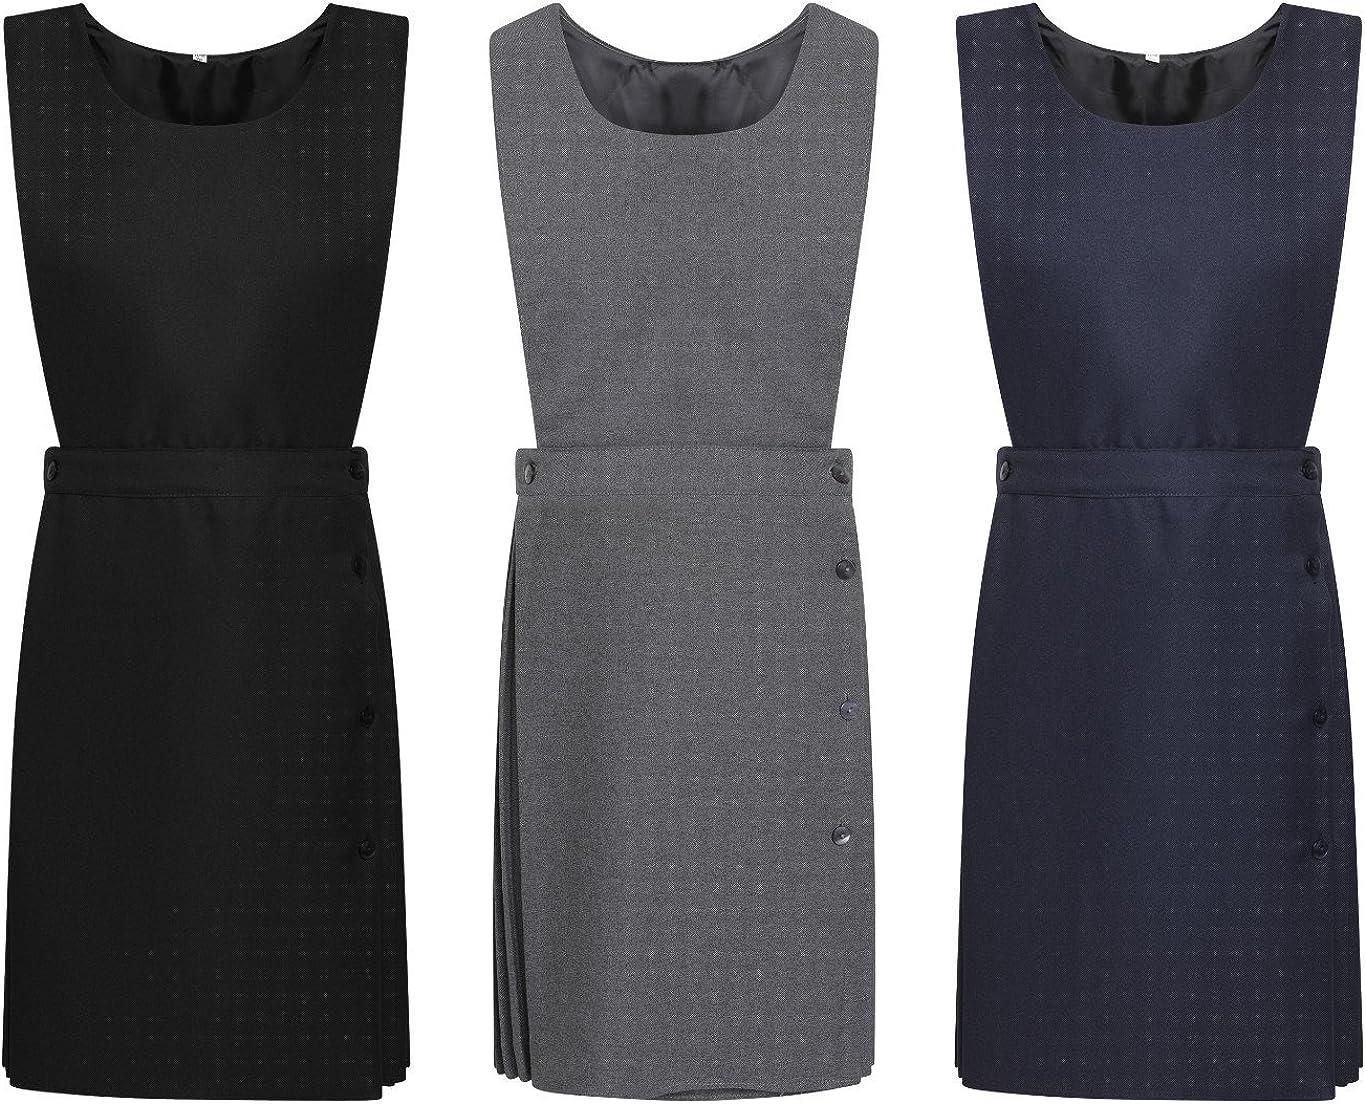 Pleated Bib Pinafore Dress Ages 2-16 Girls School Uniform Grey Navy Black Maroon